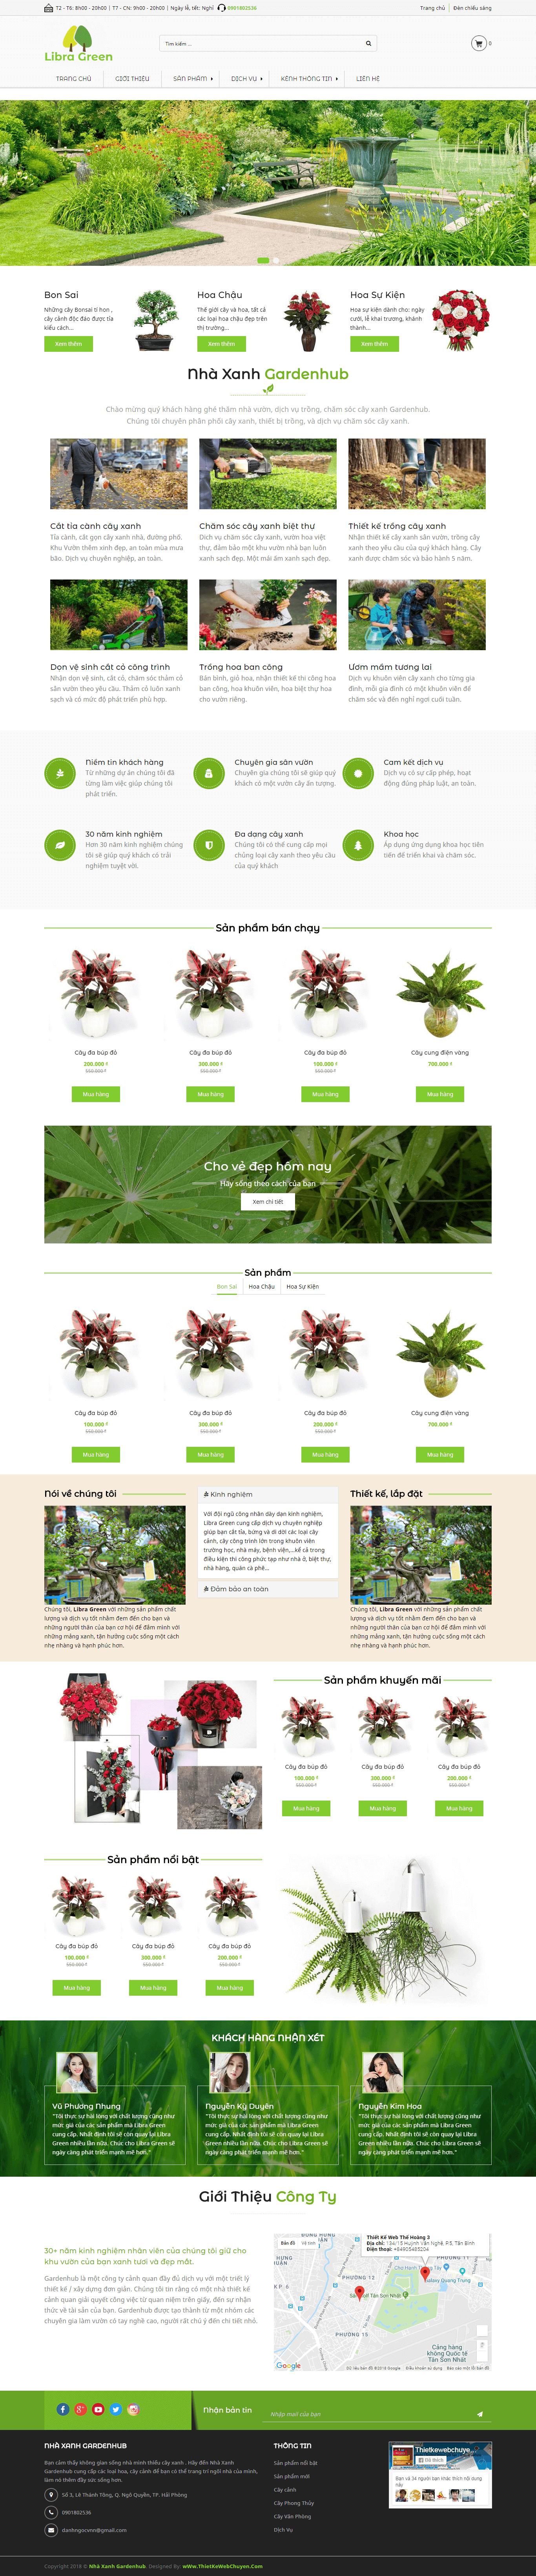 Mẫu web bán hoa tươi 273869020